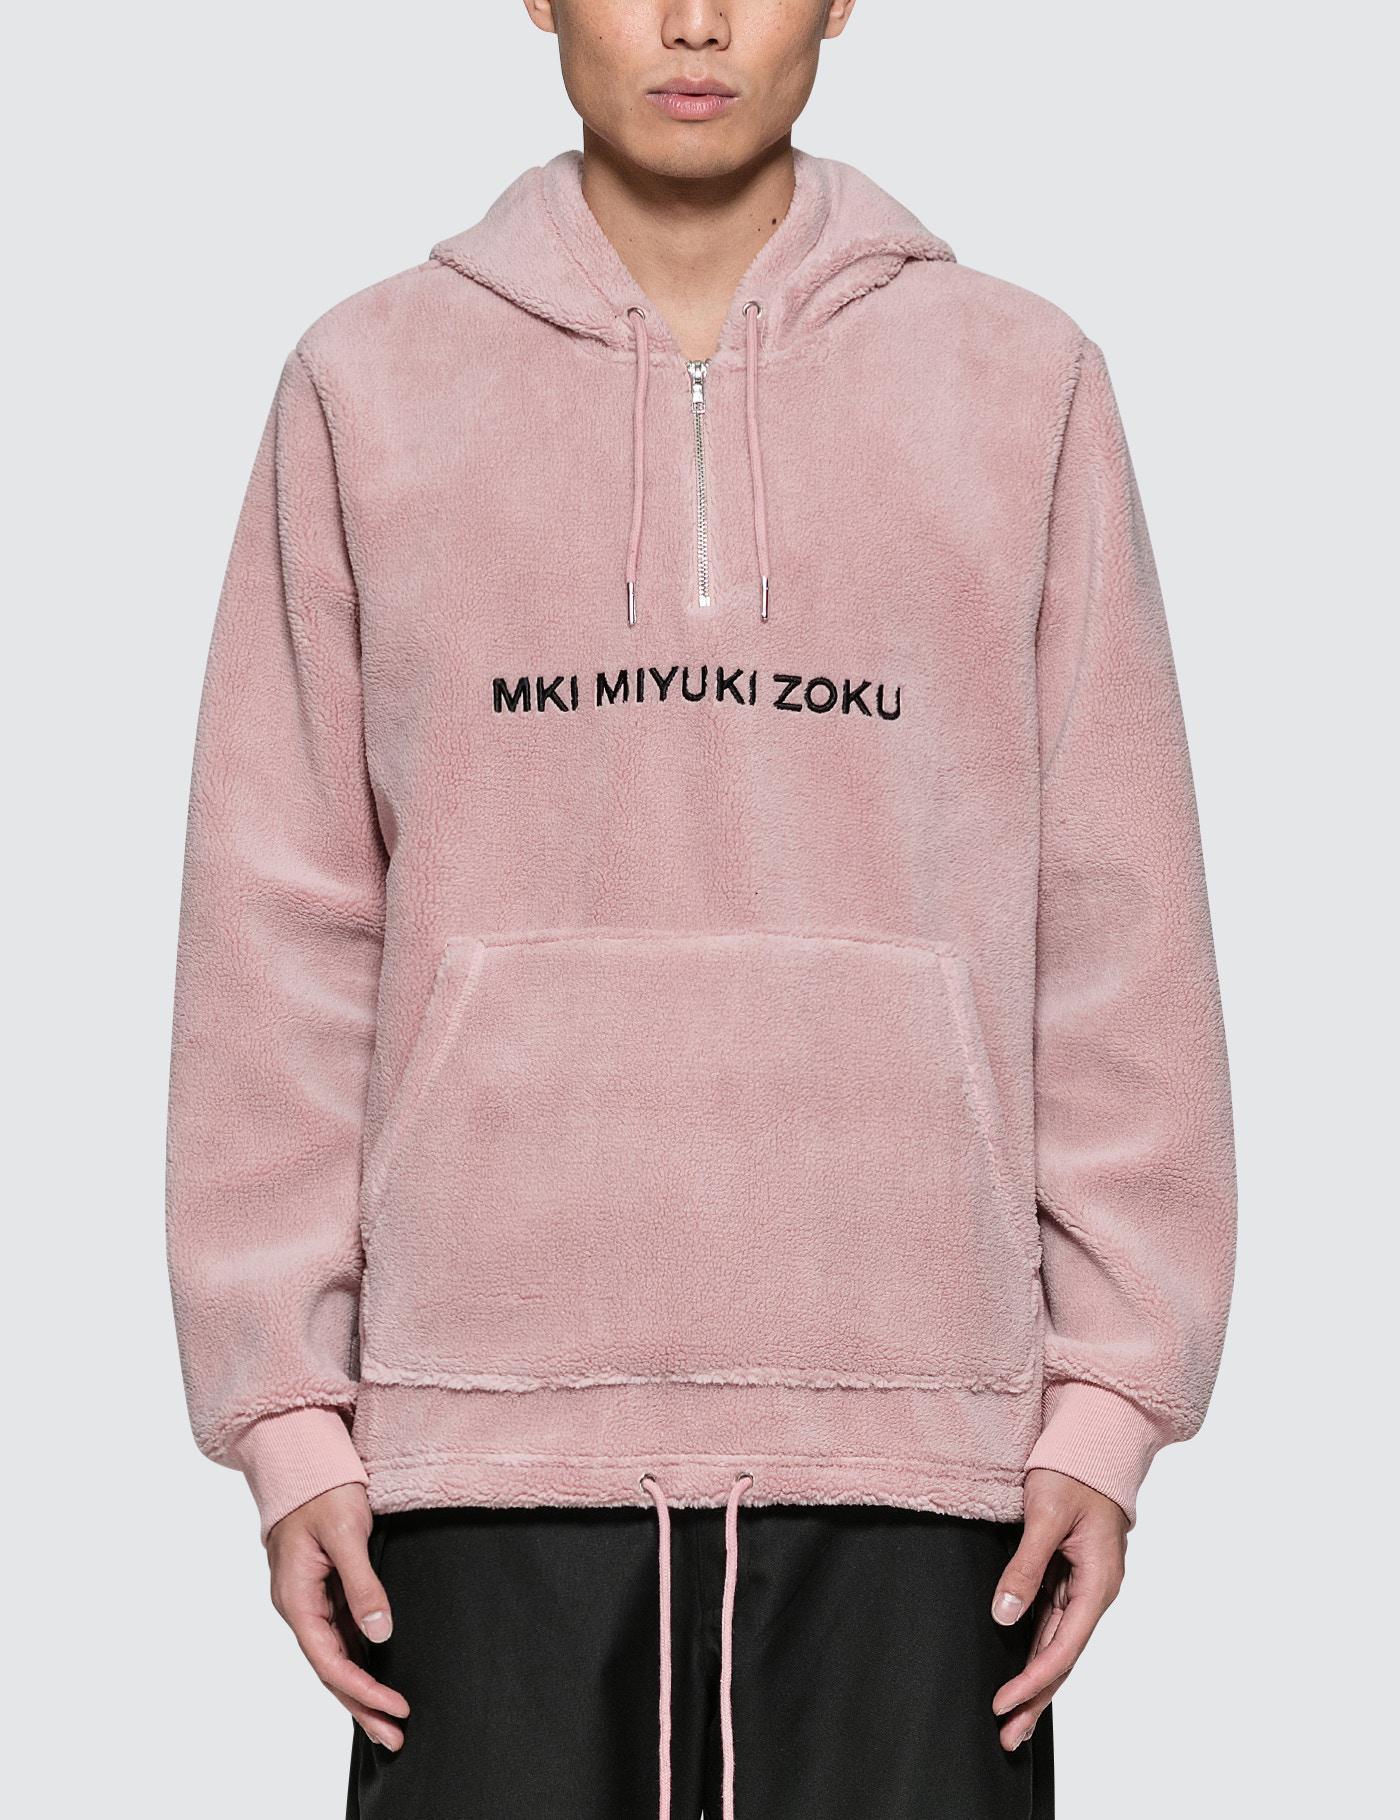 Mki miyuki-zoku Sherpa Hoodie in Pink for Men | Lyst